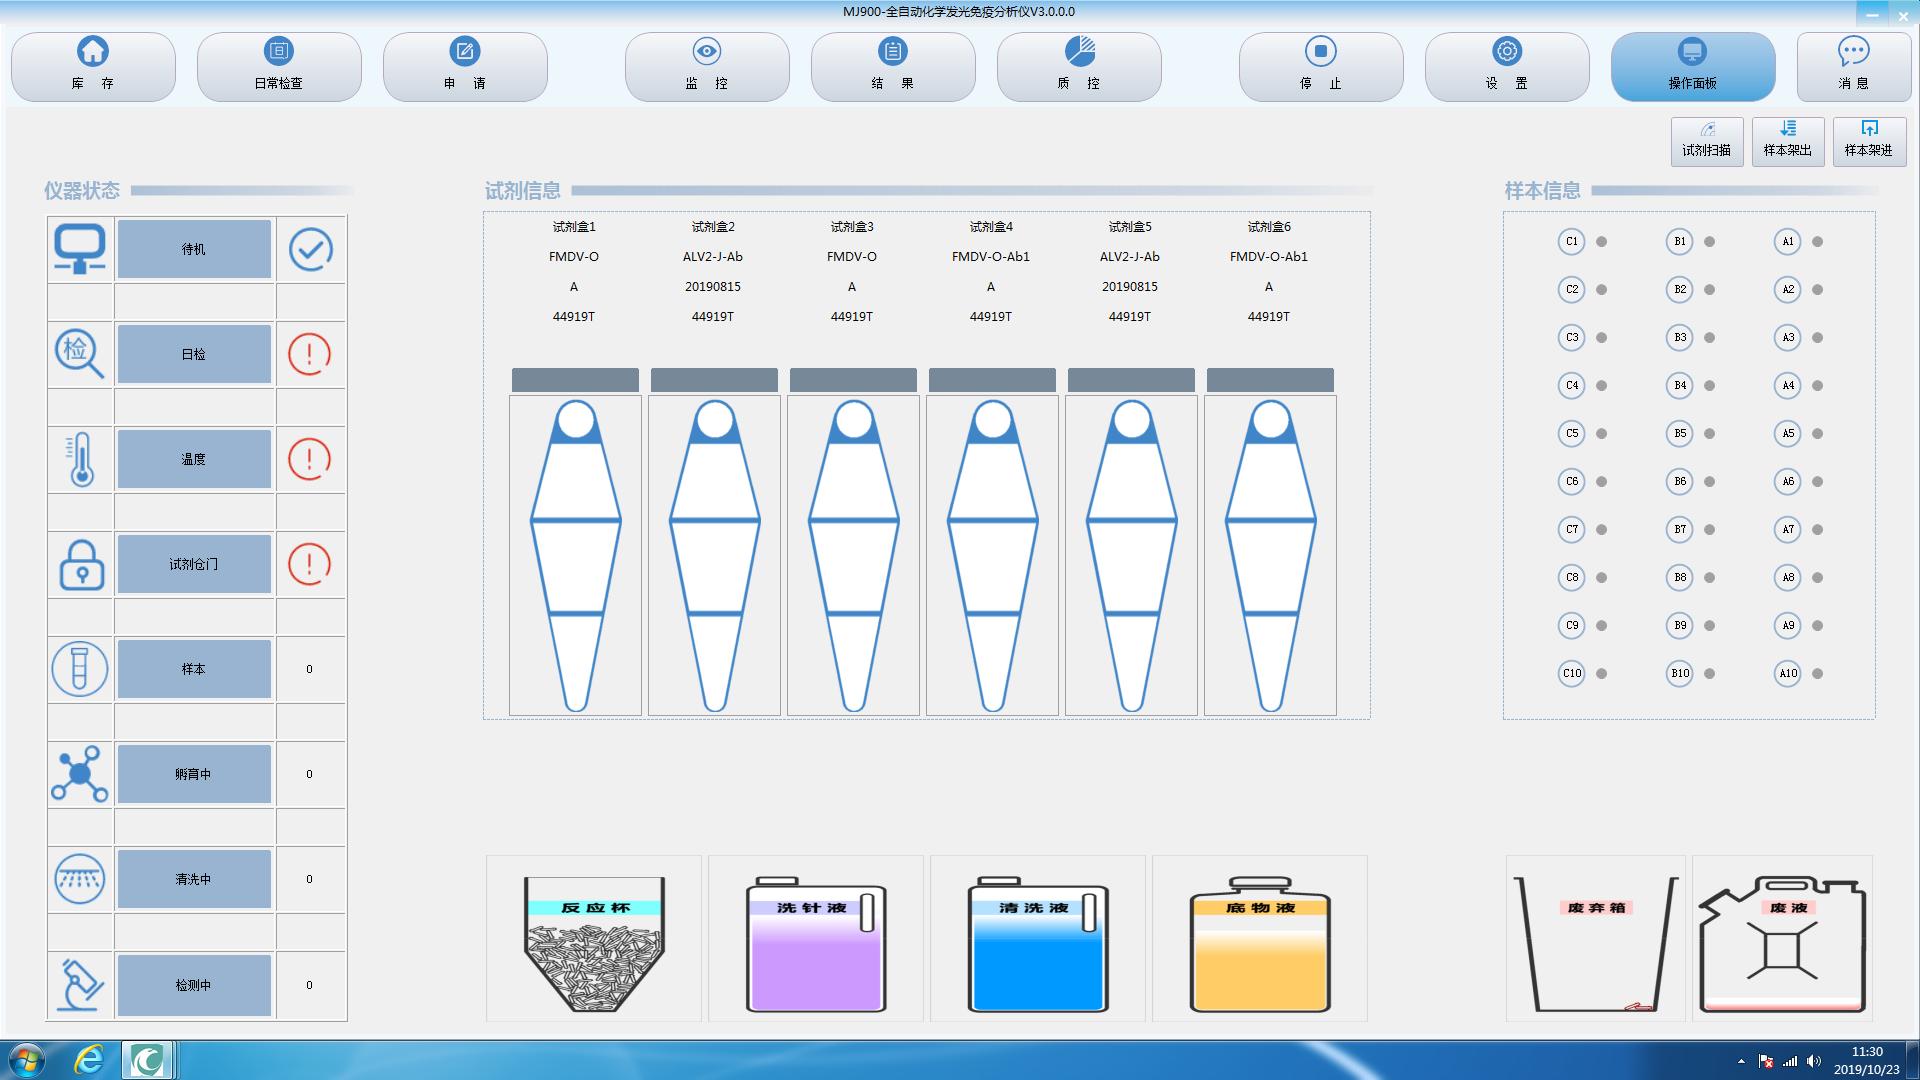 MJ900软件界面